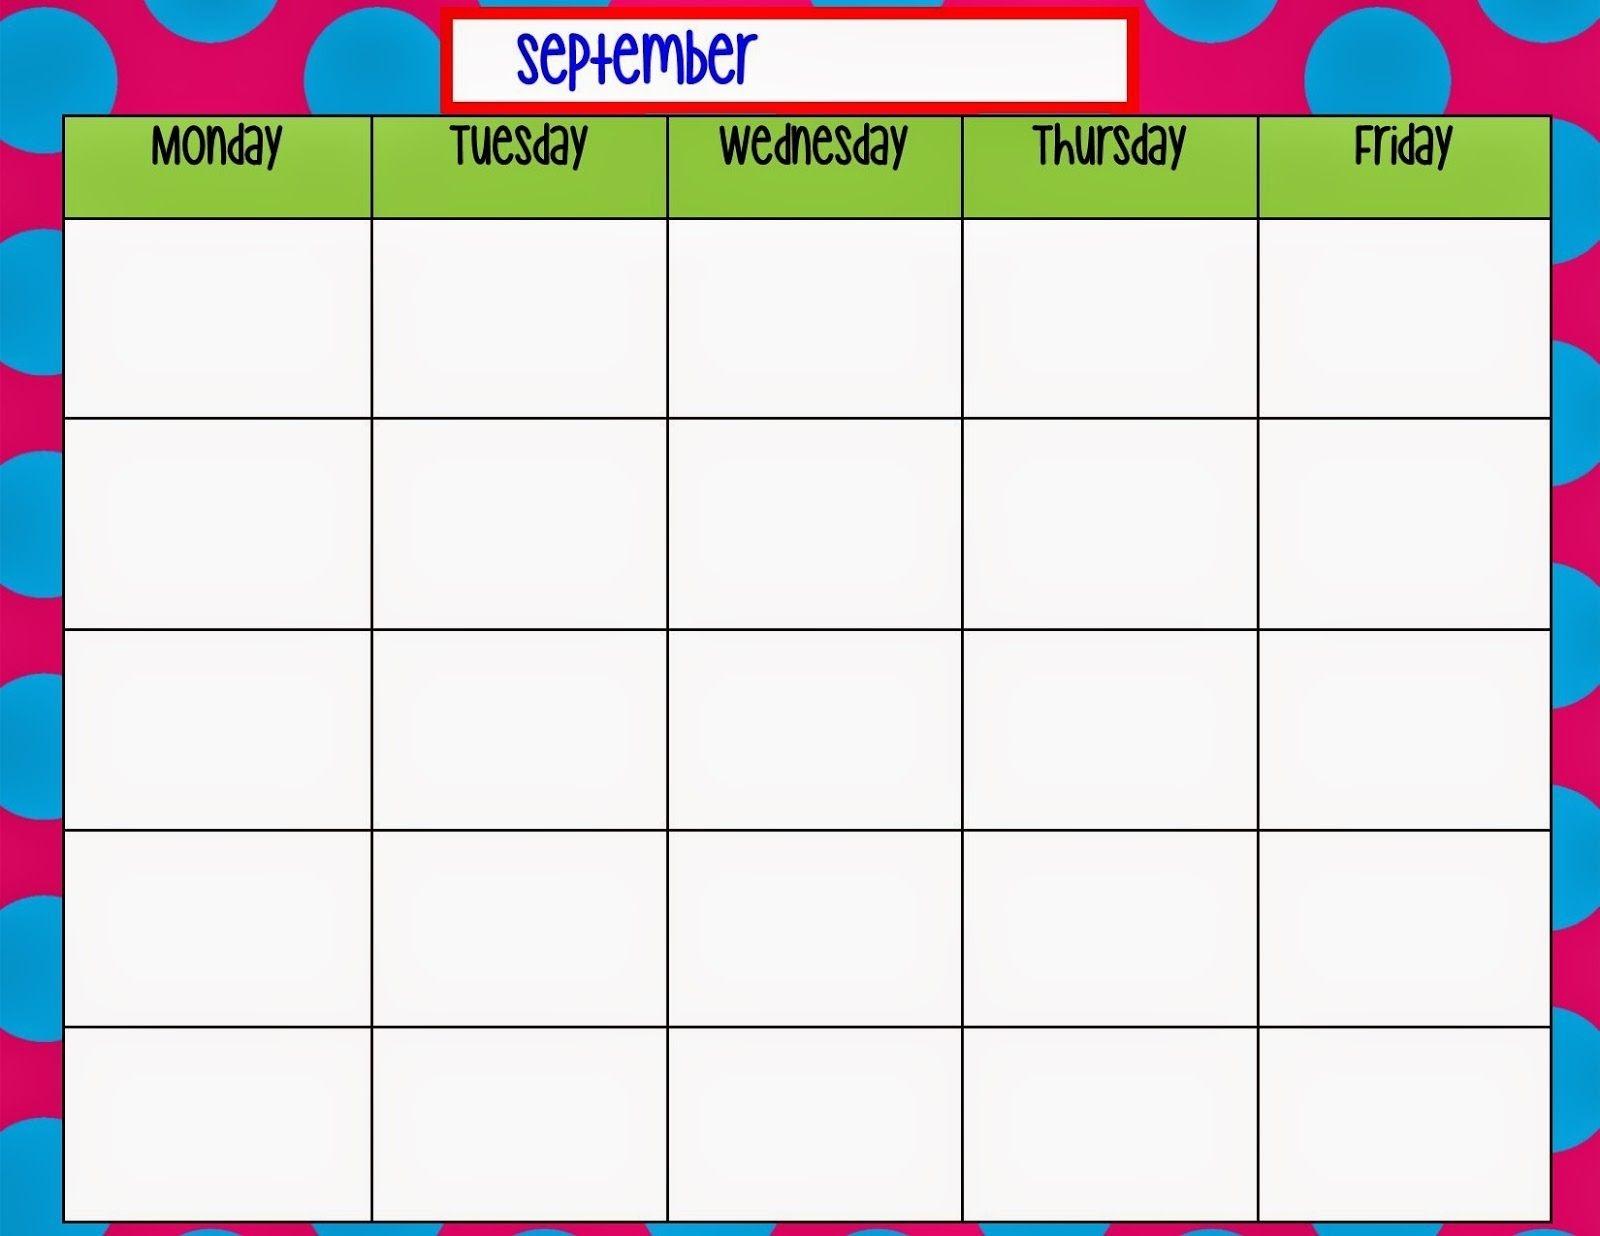 Monday Through Friday Calendar Template | Weekly Calendar-Monday Through Friday Schedule Template